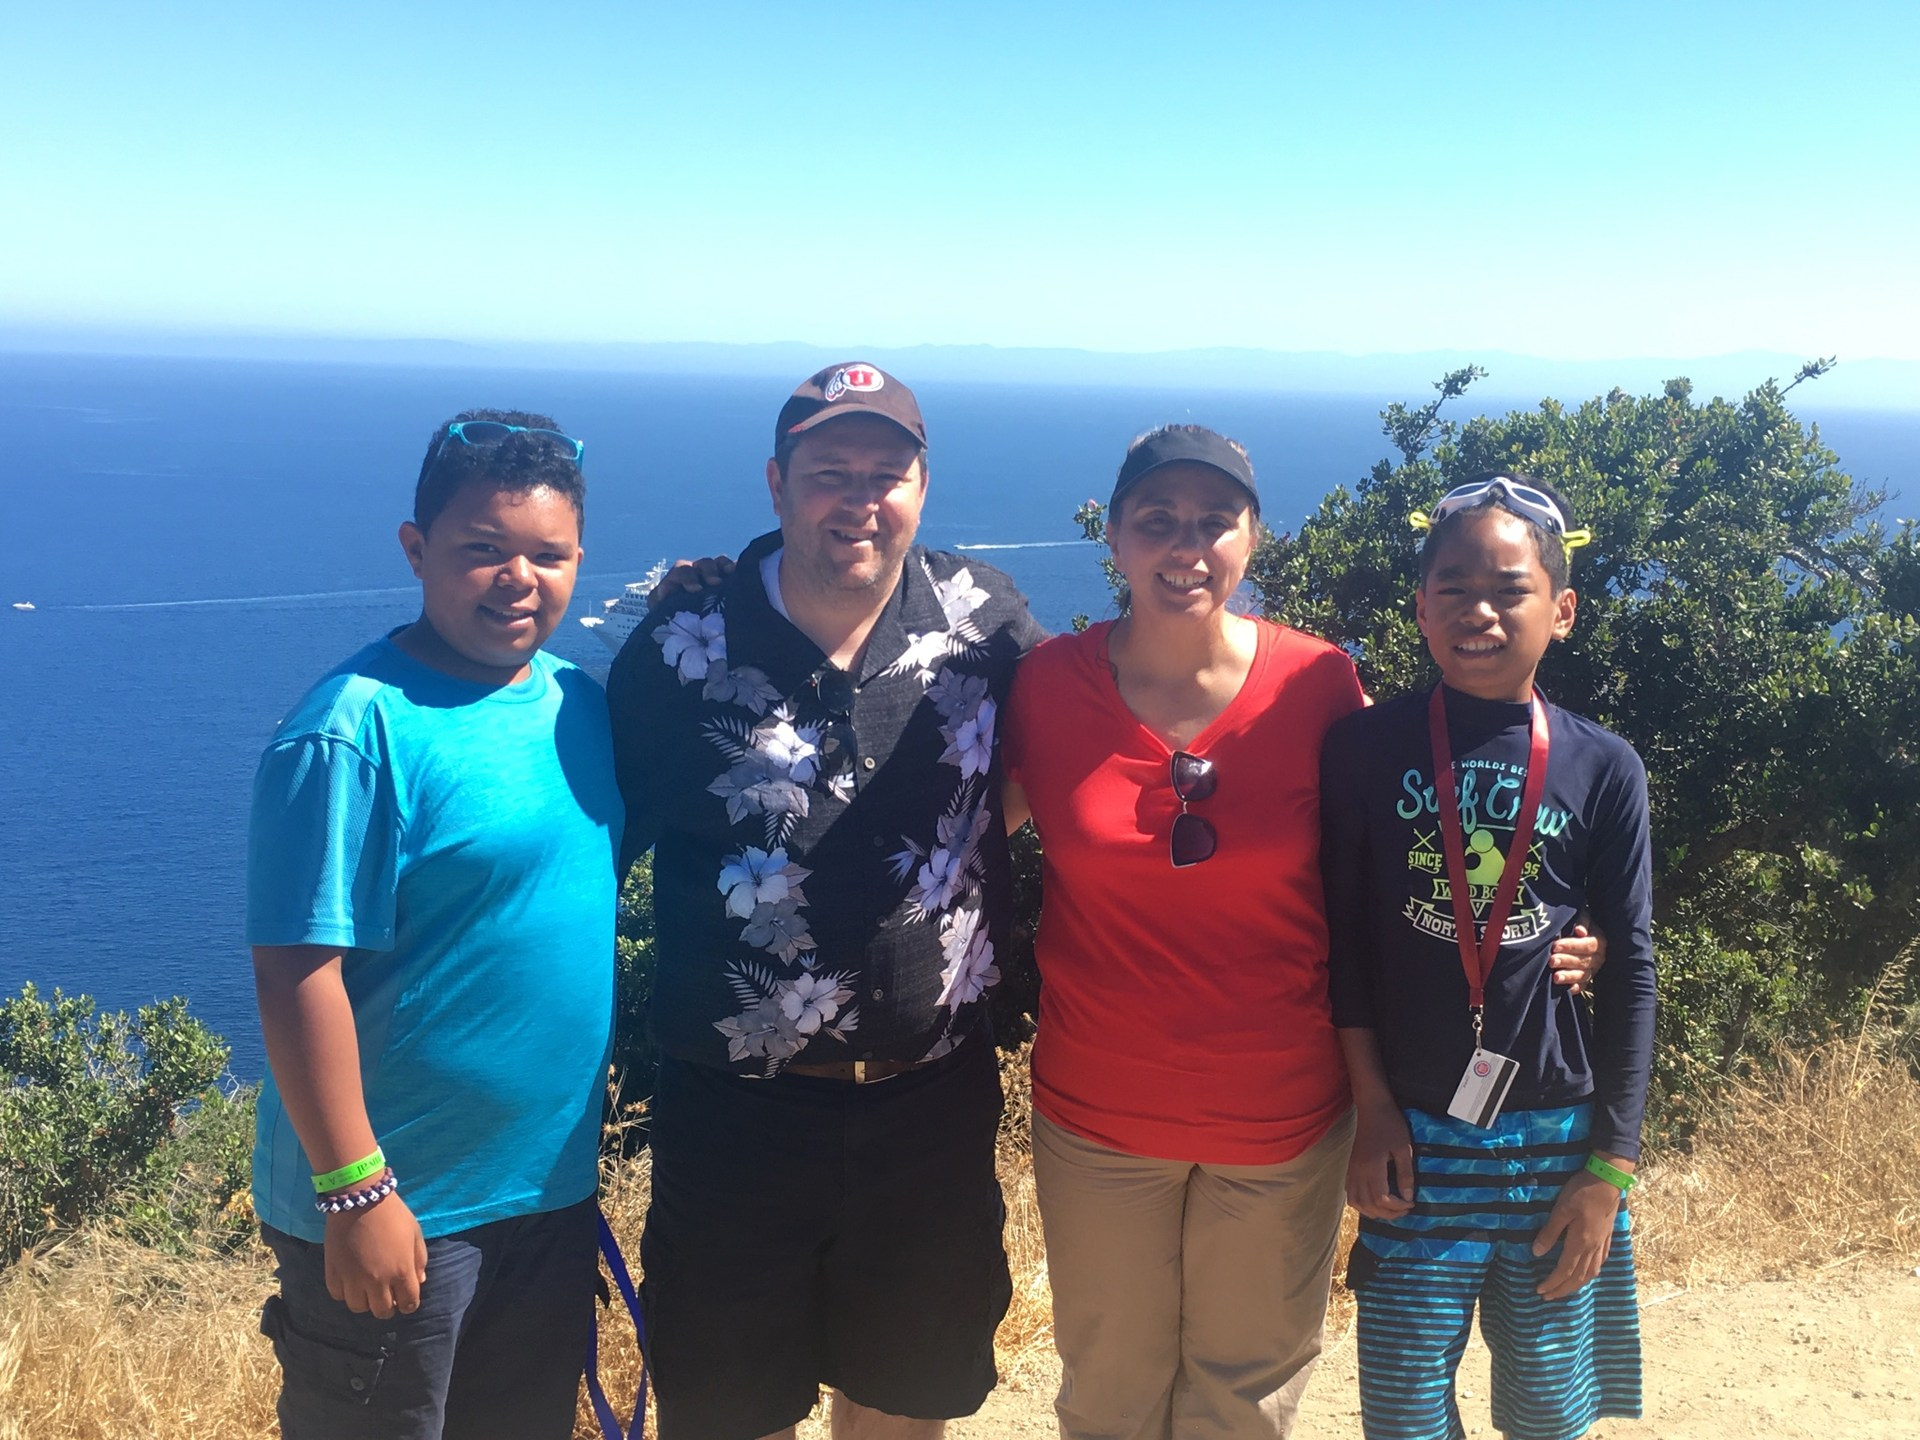 Mr oviatt with family on cruise